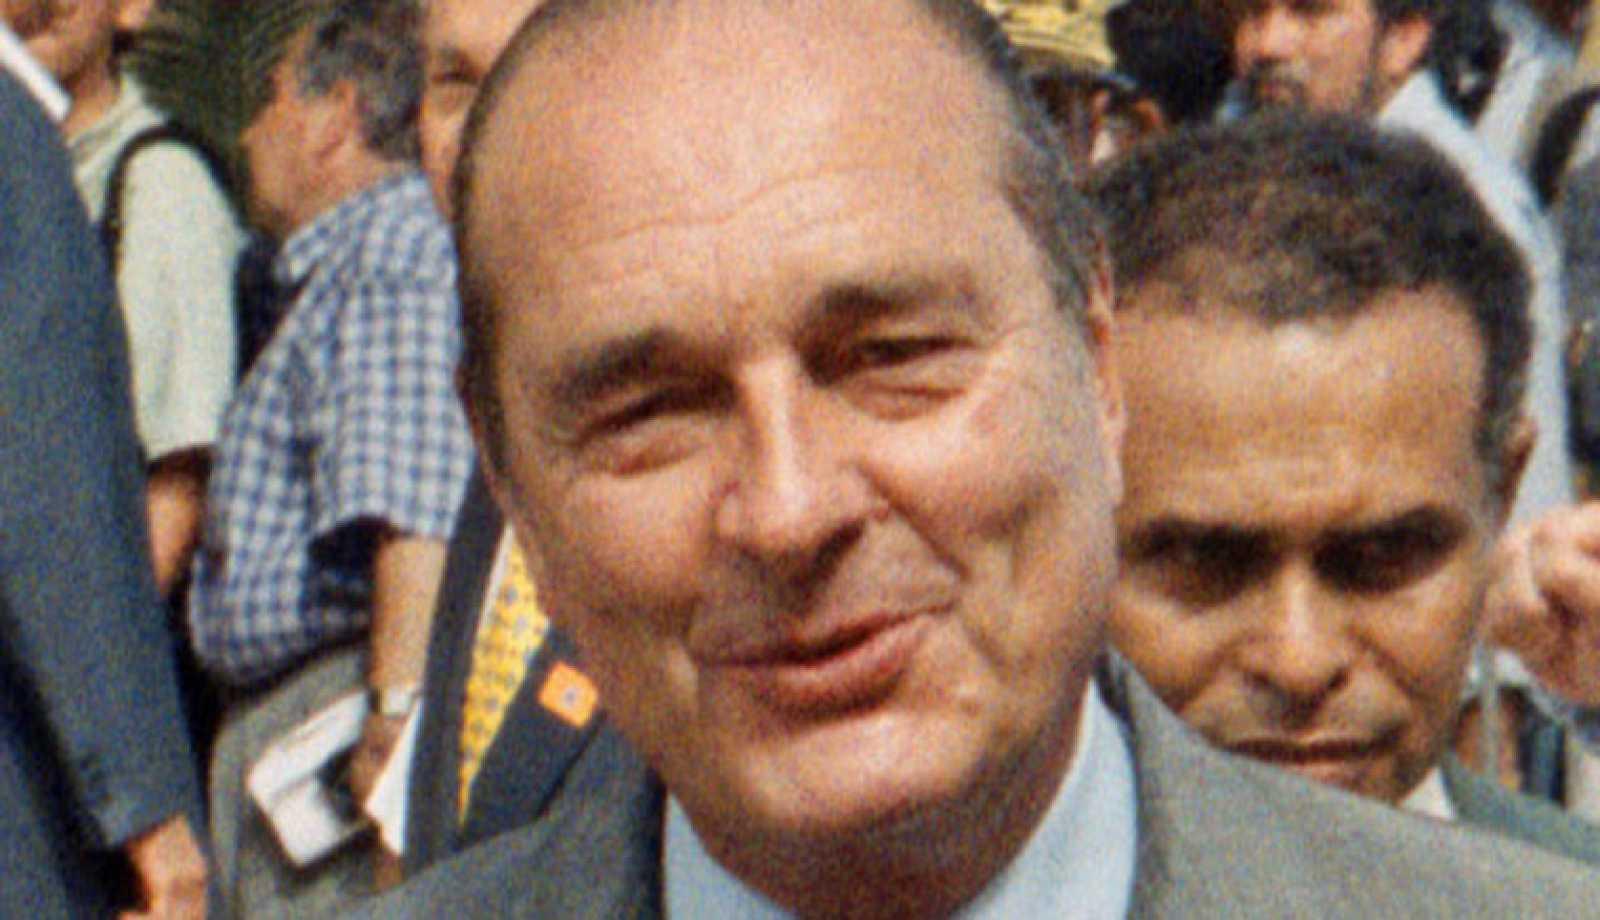 Resultado de imagen para Jacques Chirac joven